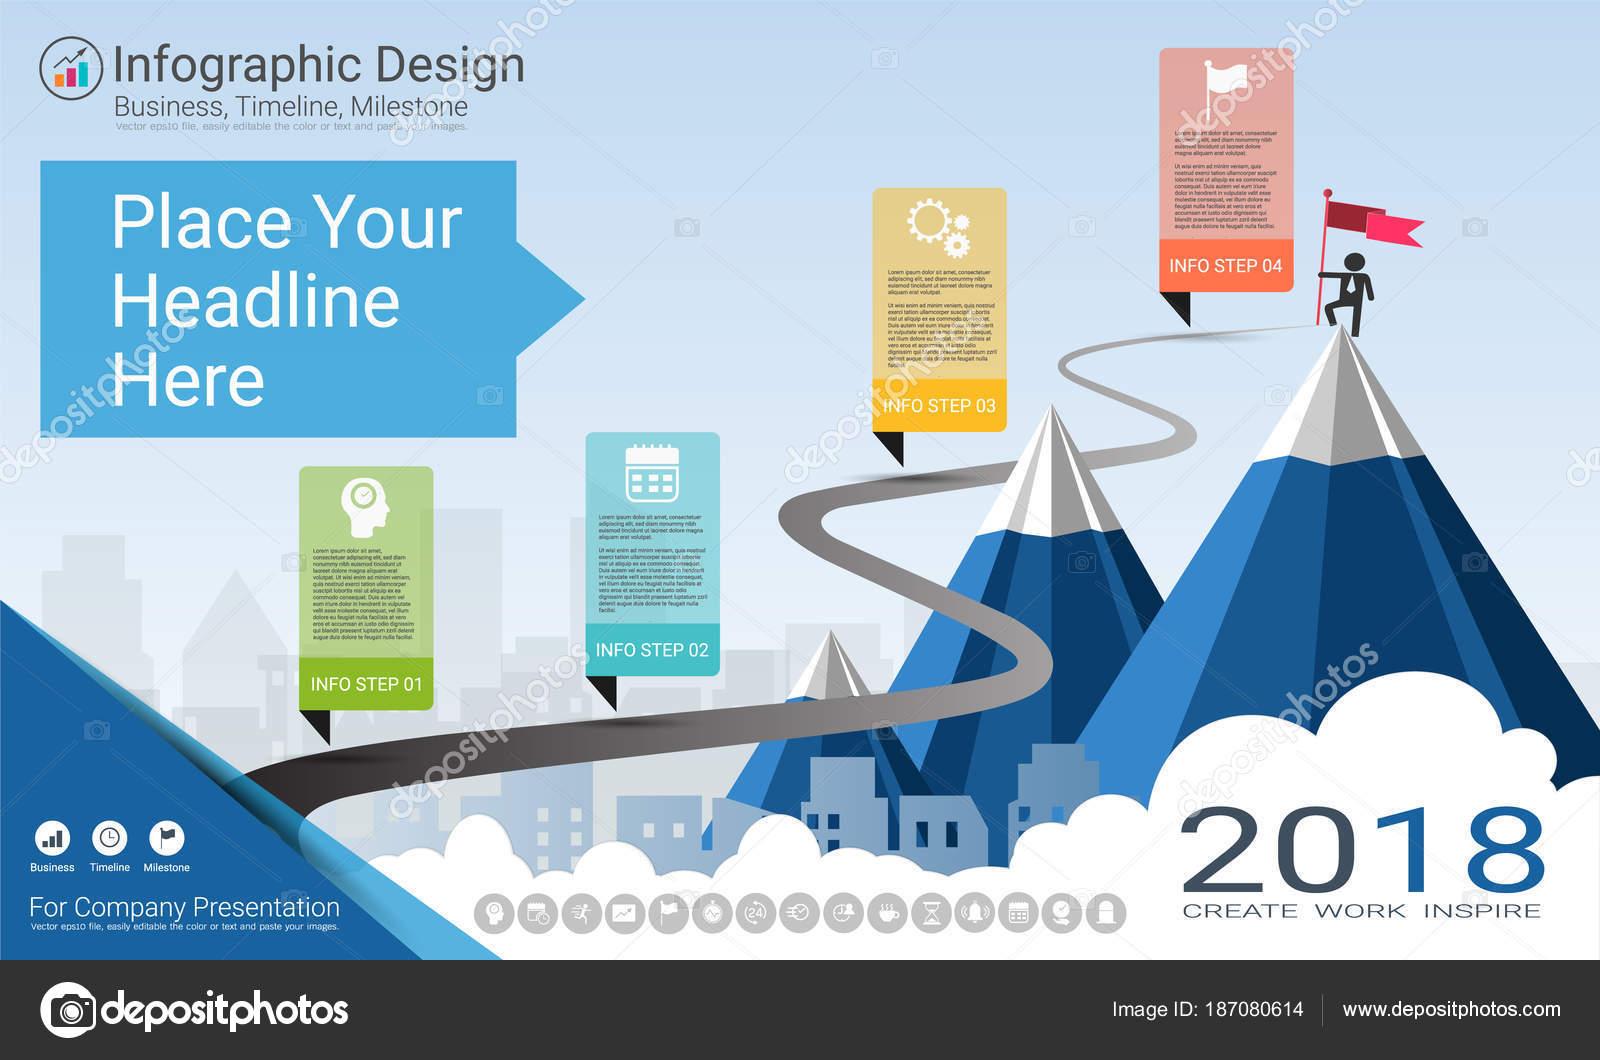 milestone timeline infographic design road map strategic plan define